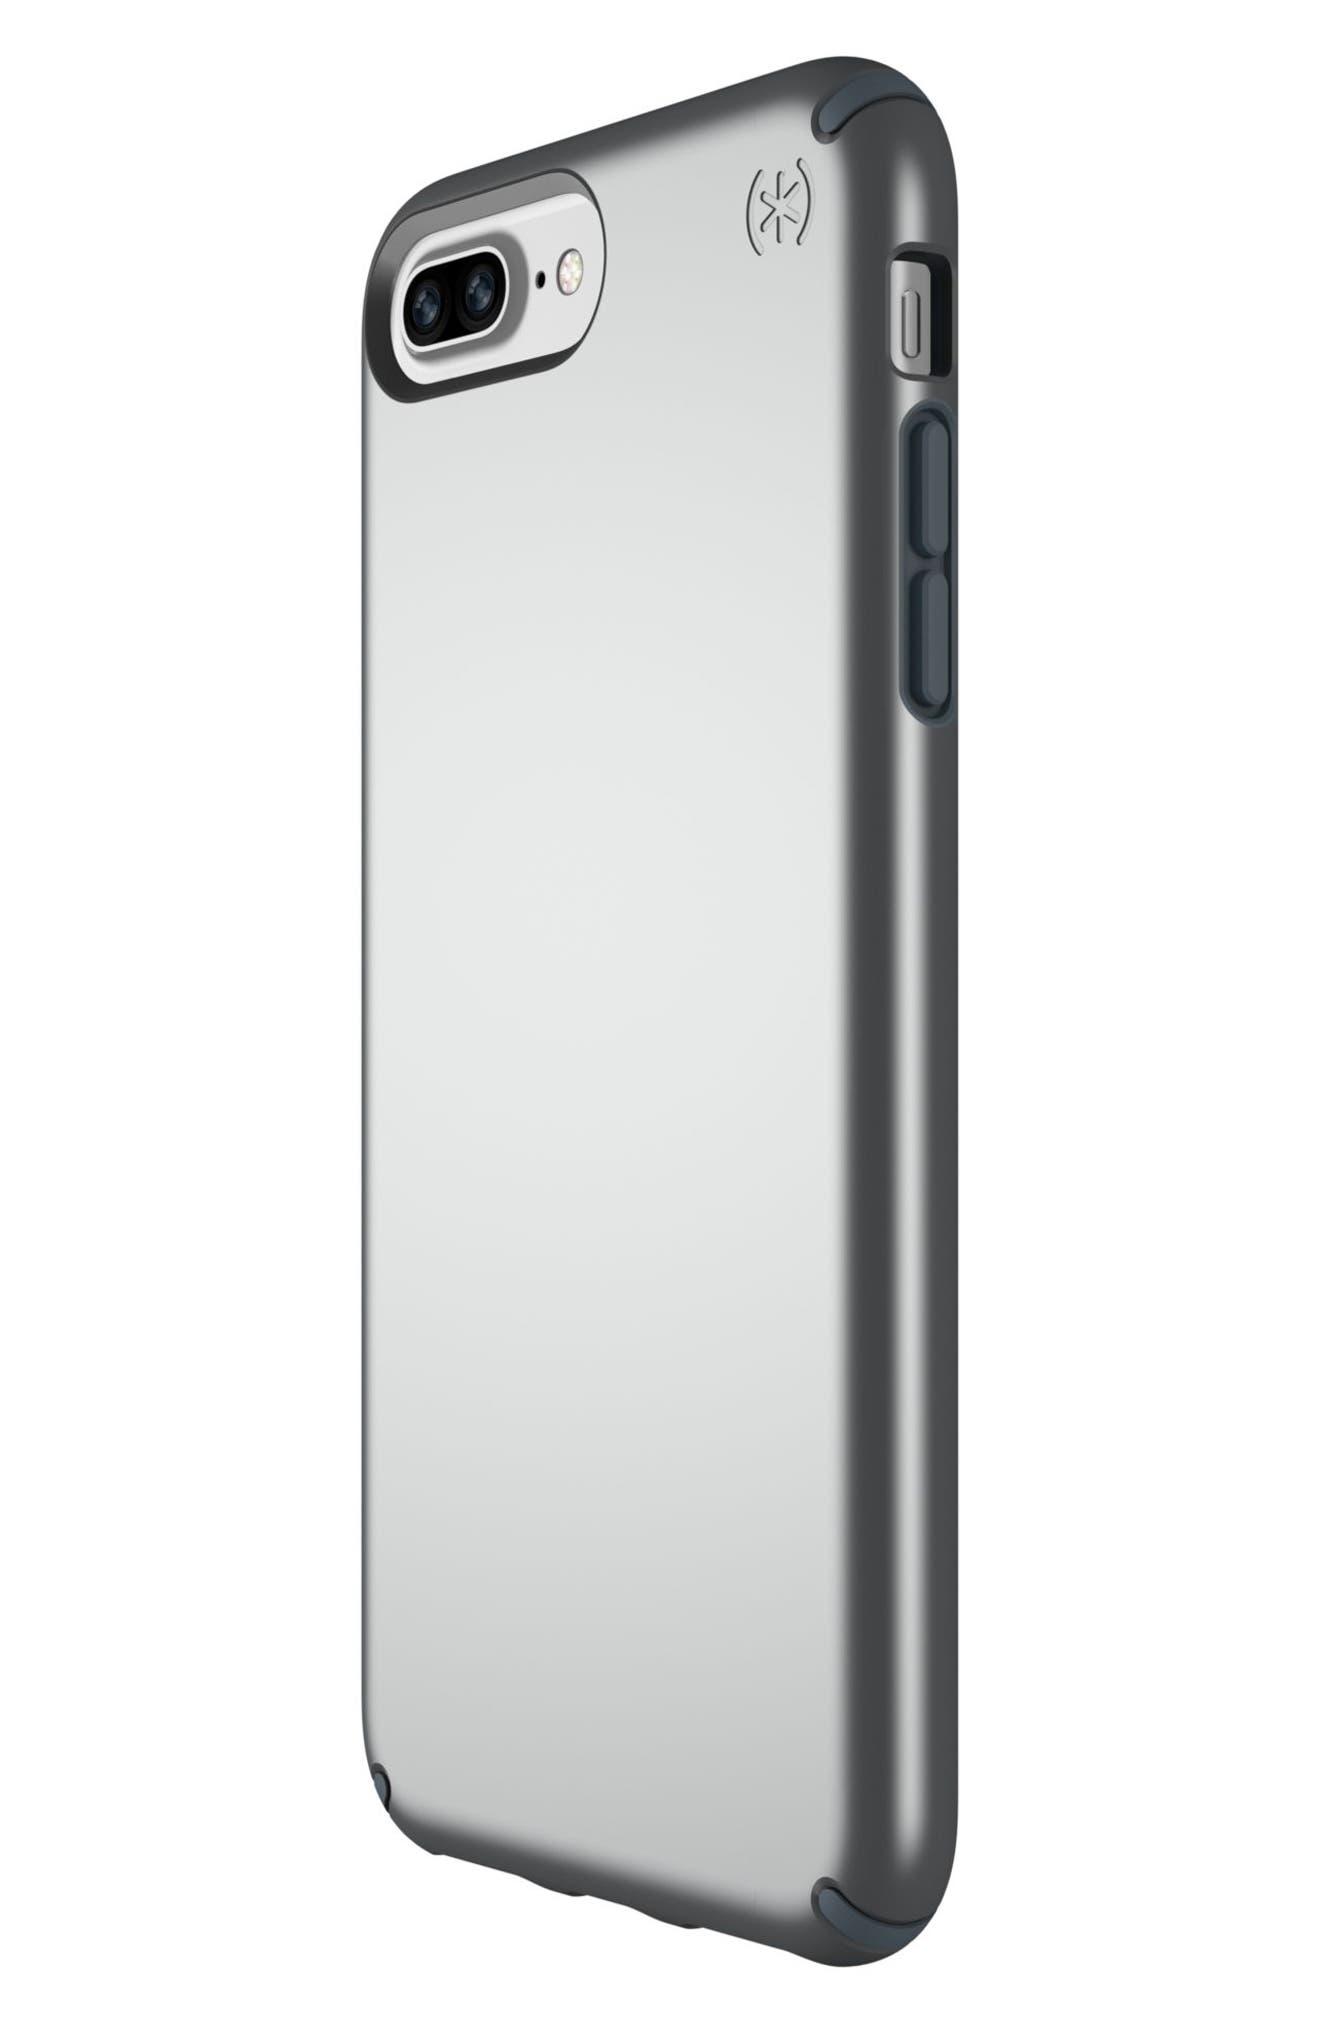 iPhone 6/6s/7/8 Case,                             Alternate thumbnail 4, color,                             Tungsten Grey Metallic/ Grey